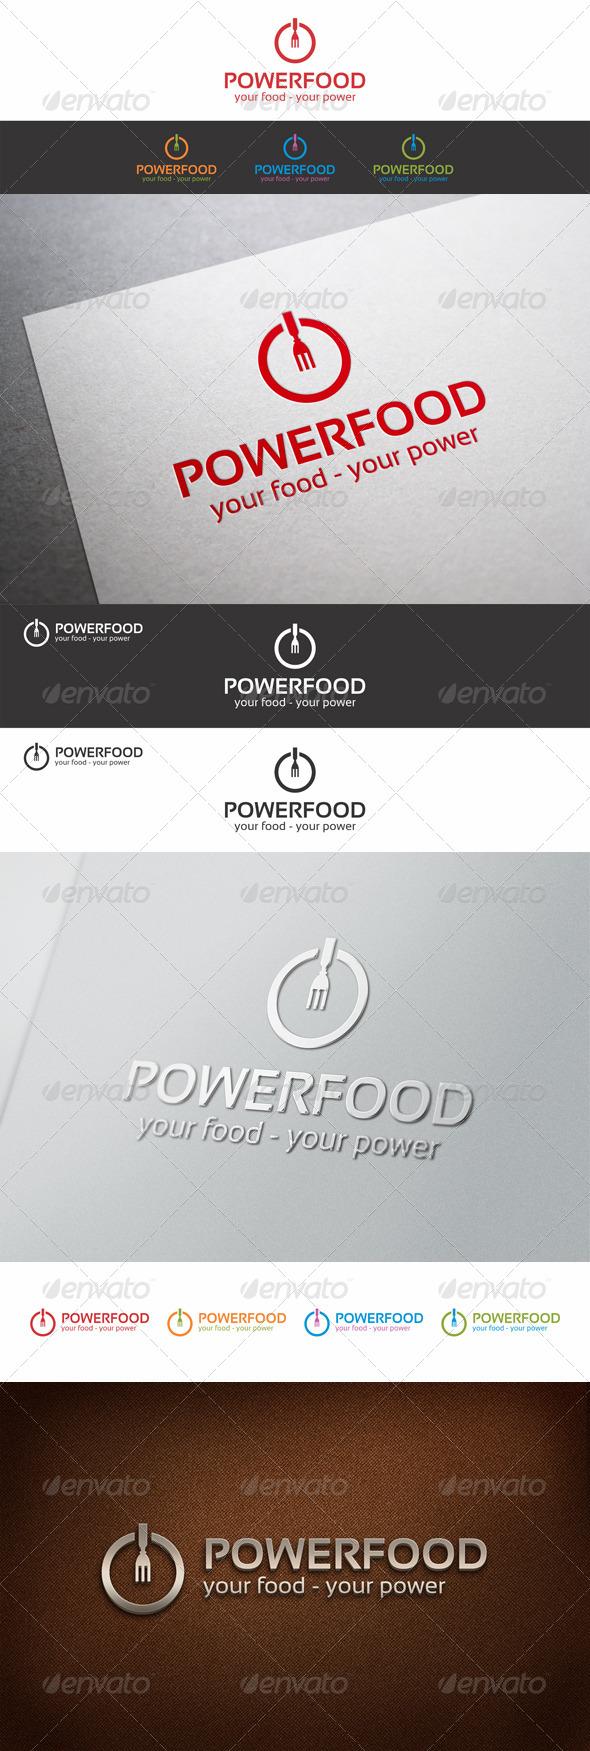 Power Food Logo Template_v2